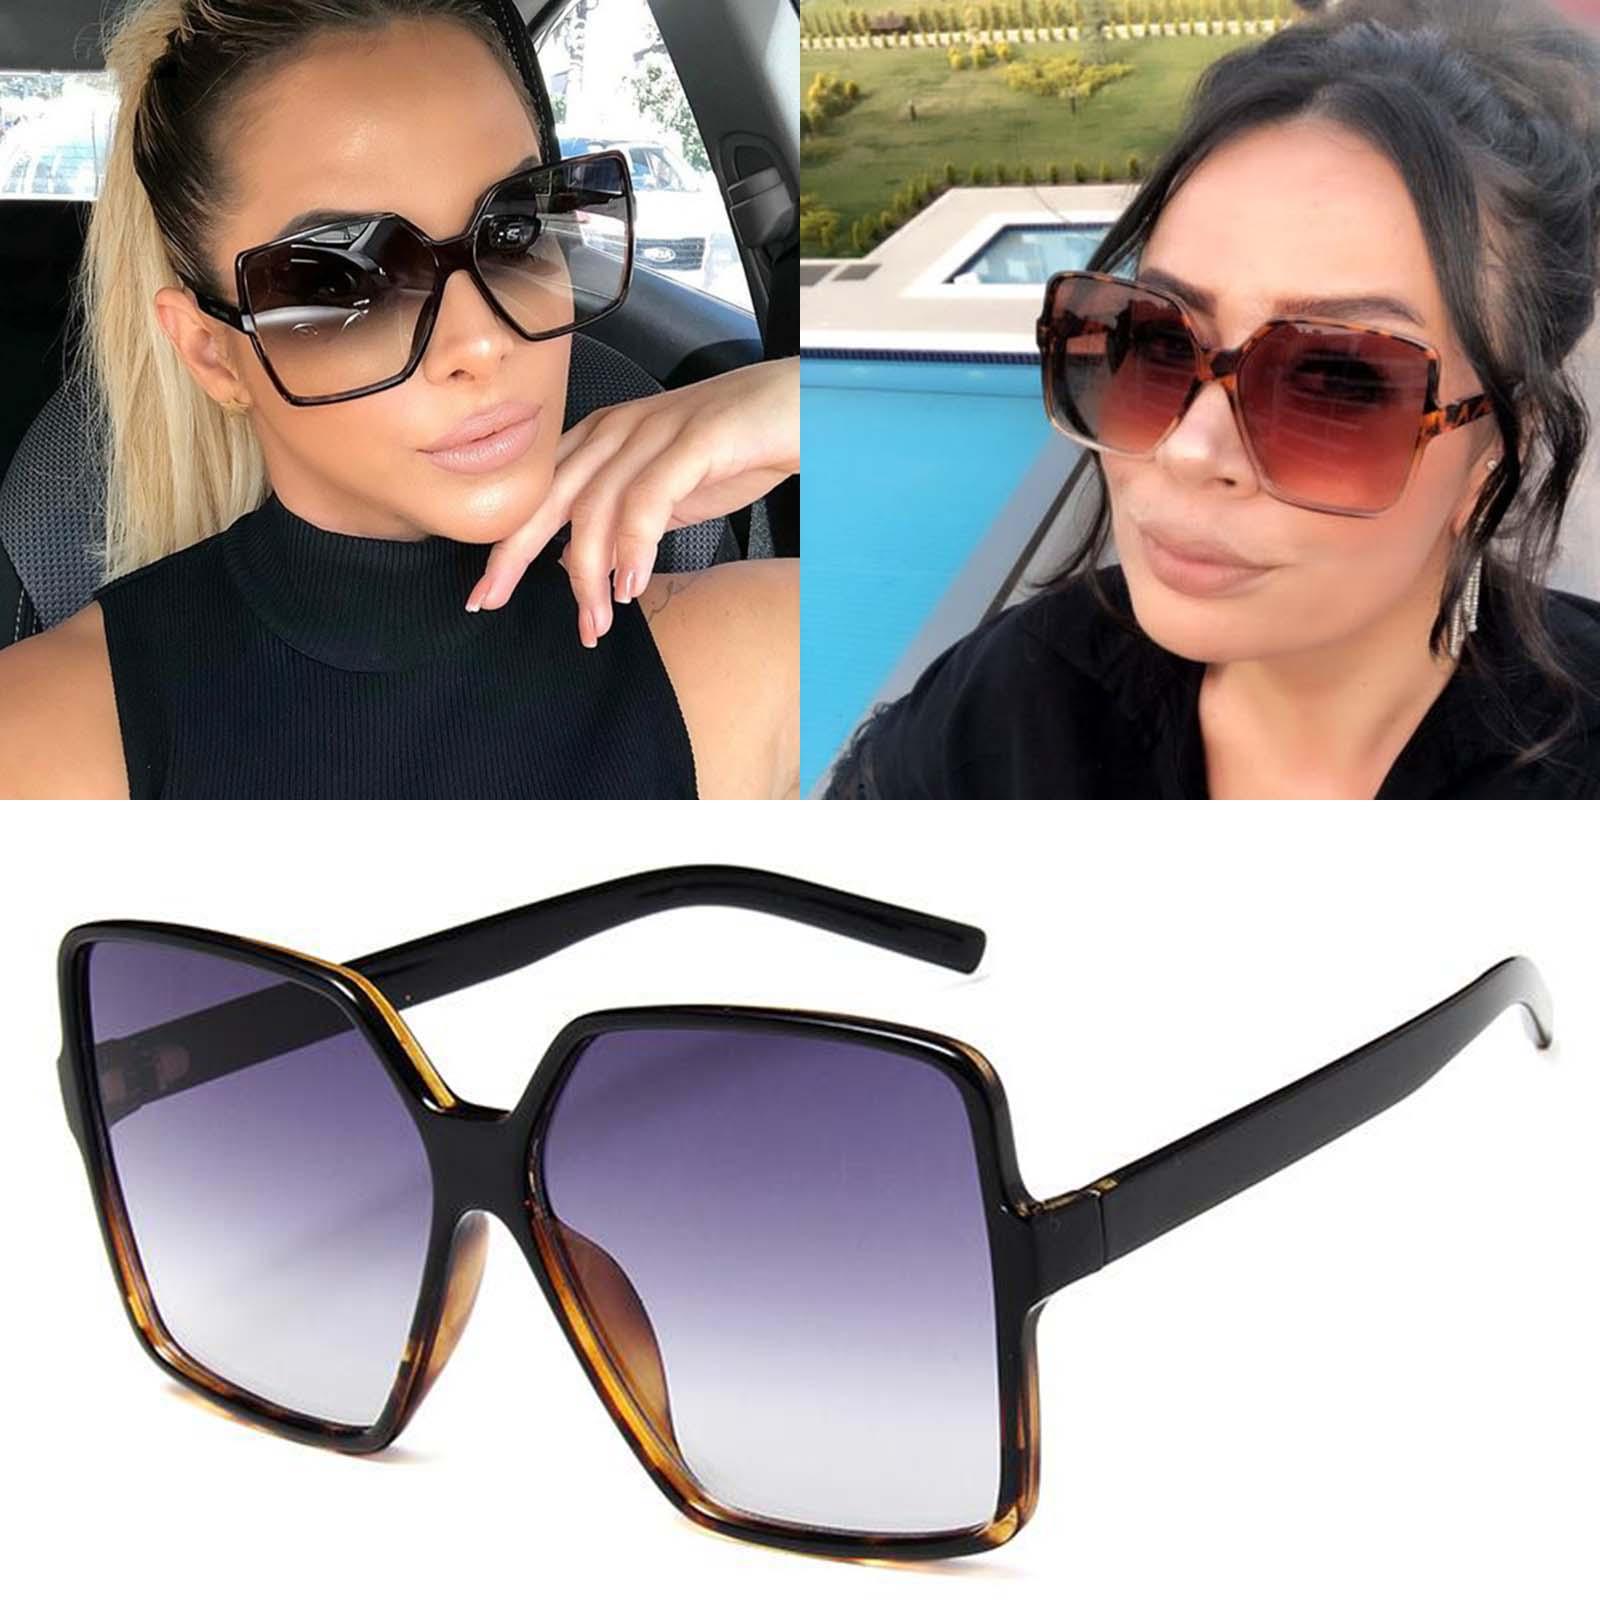 Fashion Women Oversize Sunglasses Gradient Plastic Brand Designer Female Sun Glasses Uv400